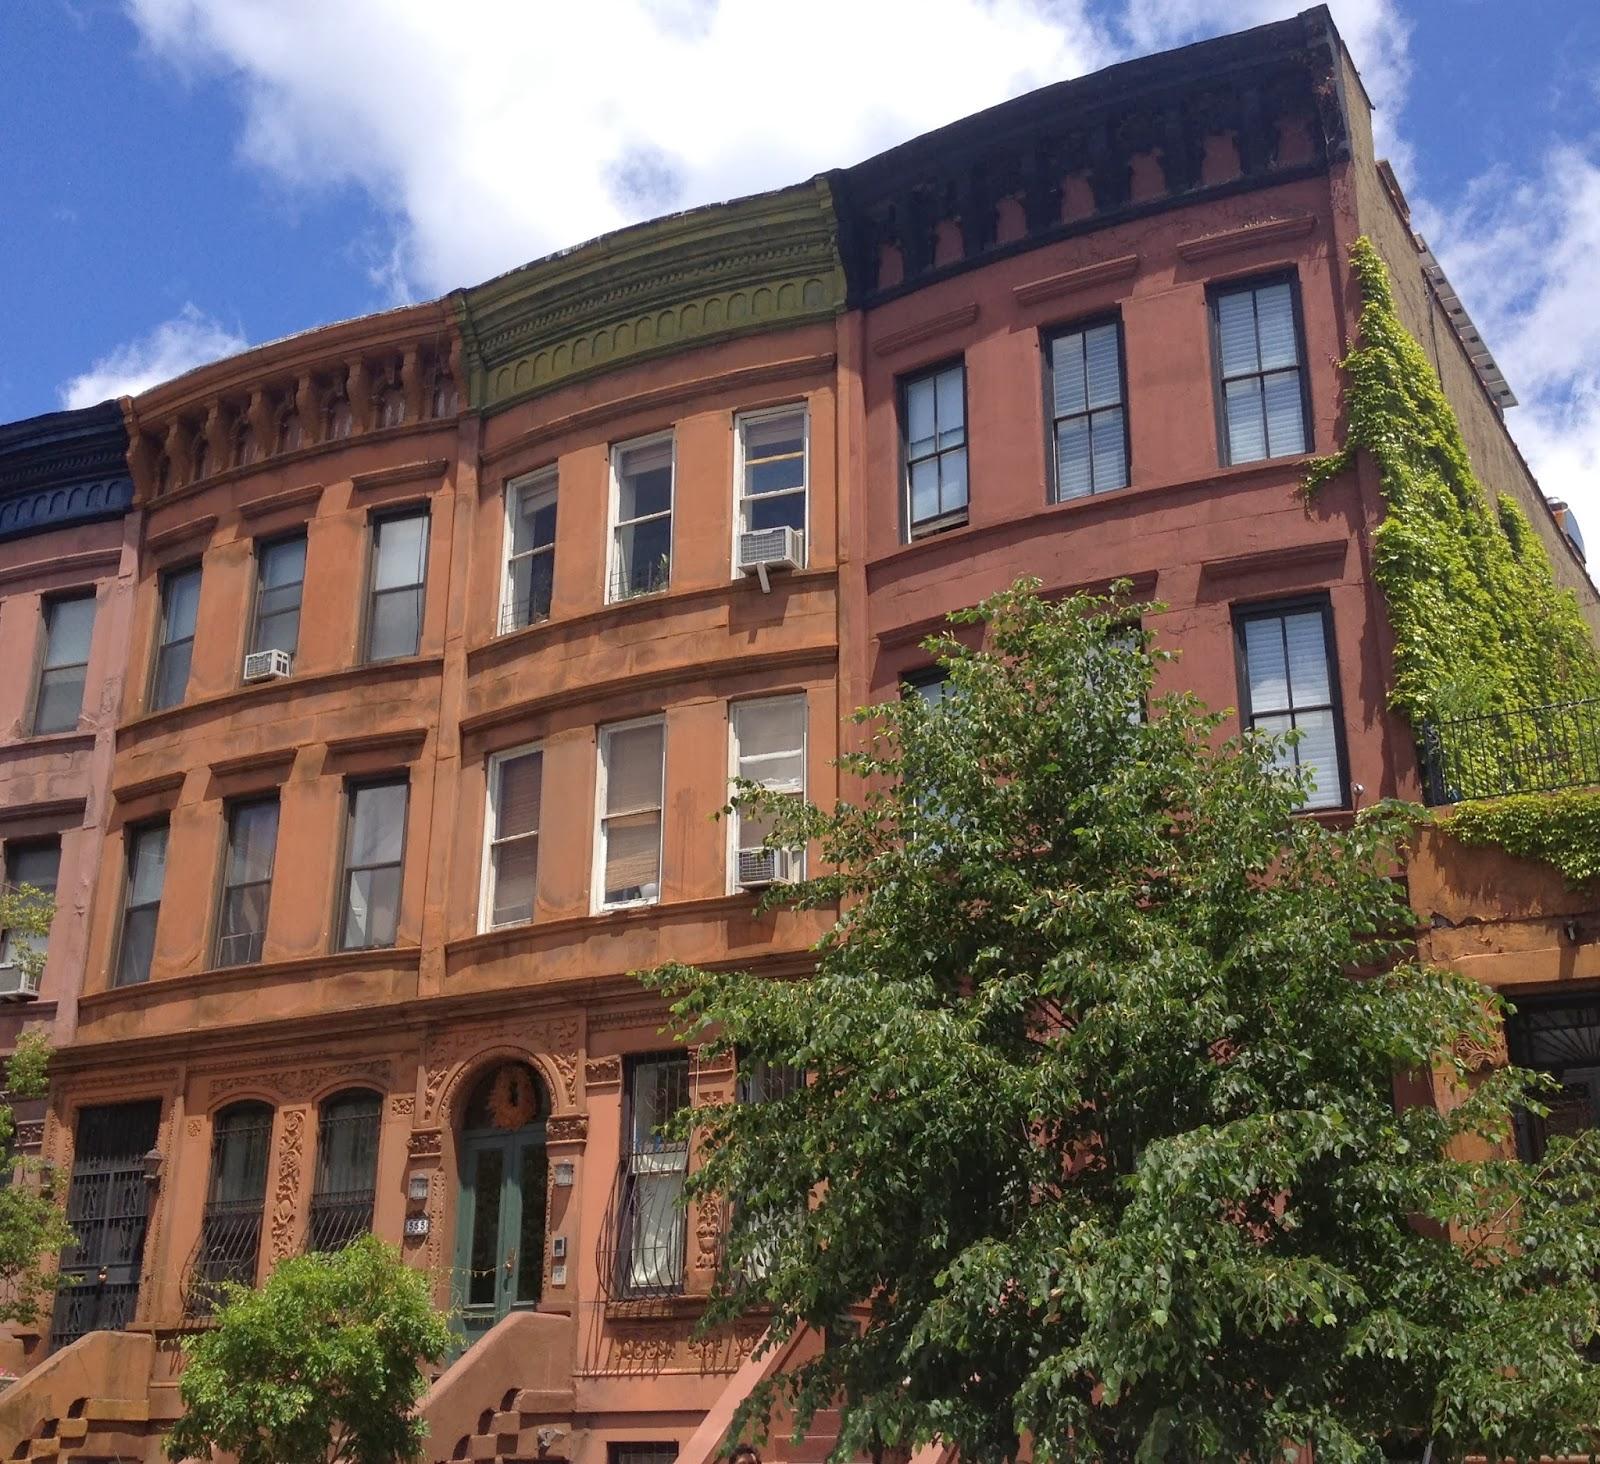 H A R L E M + B E S P O K E: ☞ DWELL: An Affordable Harlem